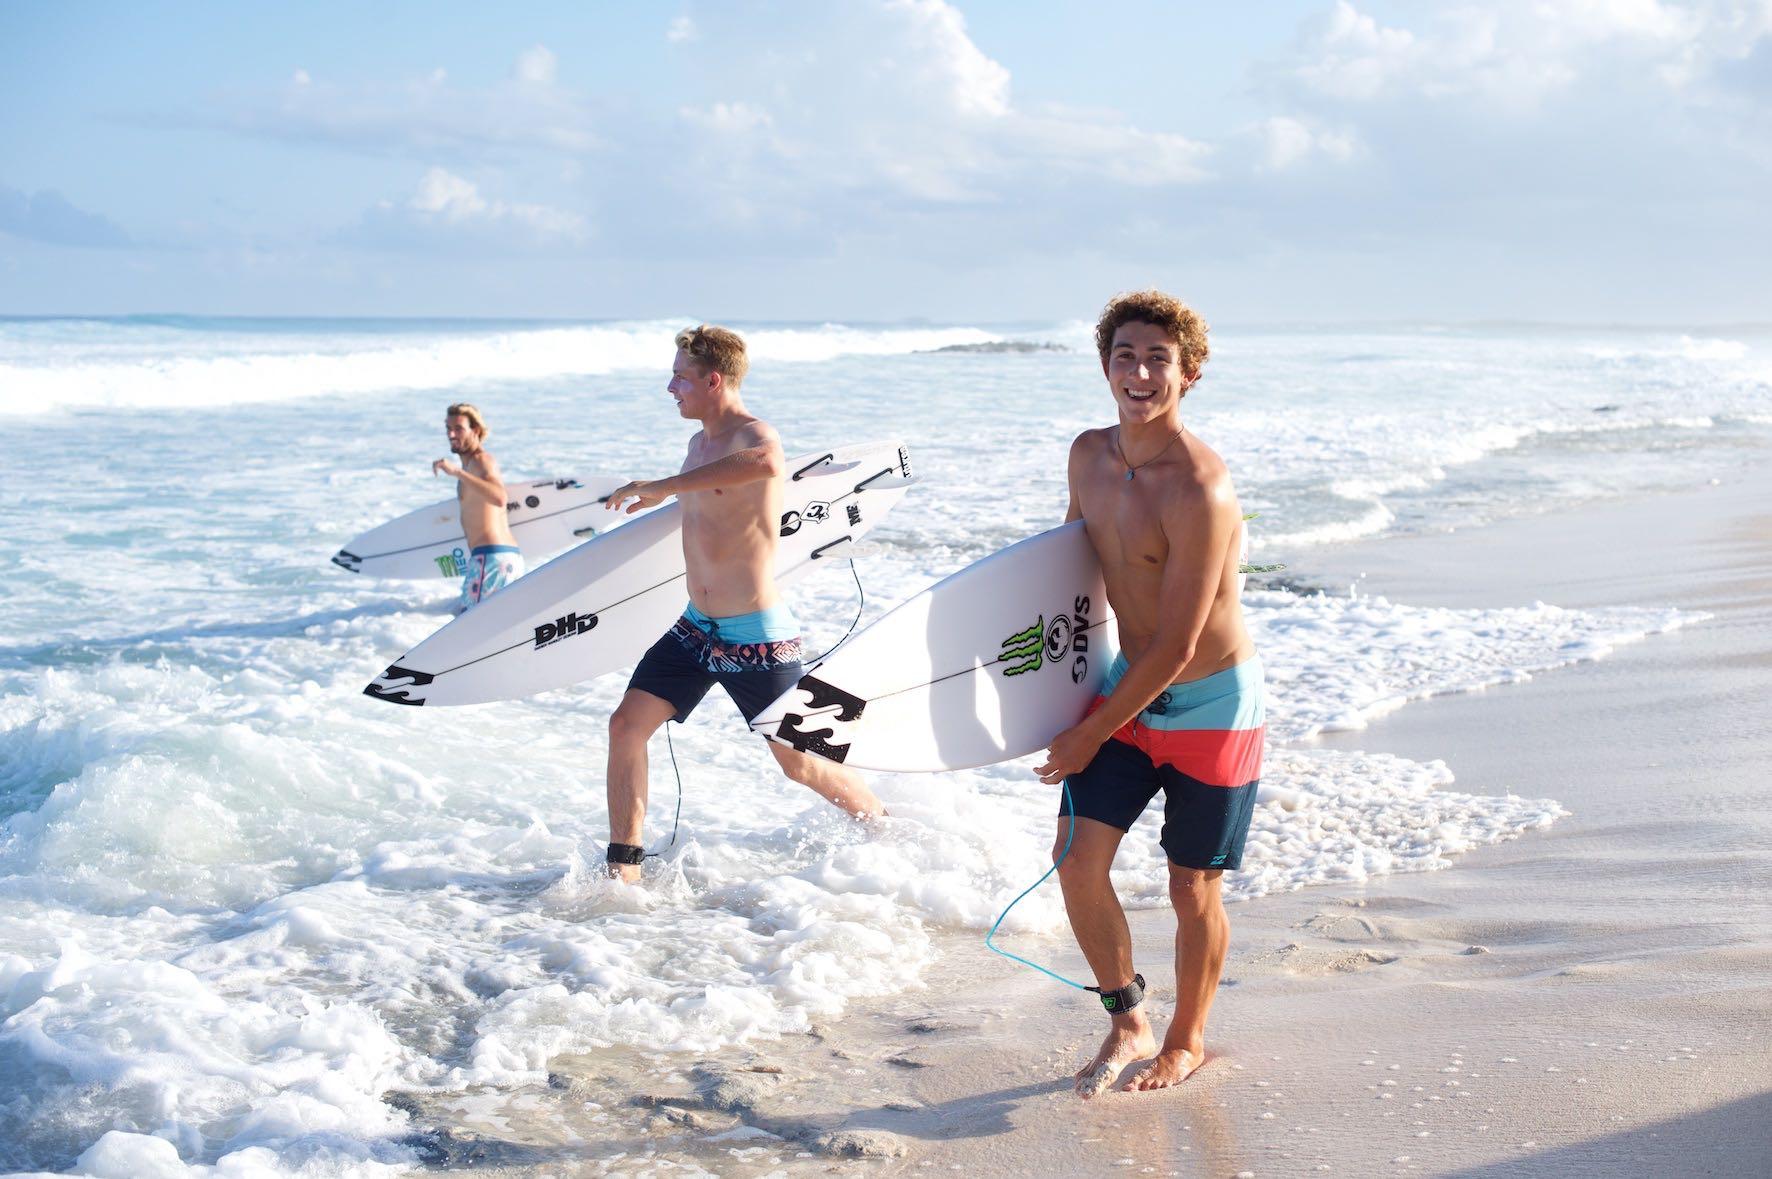 See the Summer 2018 Billabong Boardshorts range